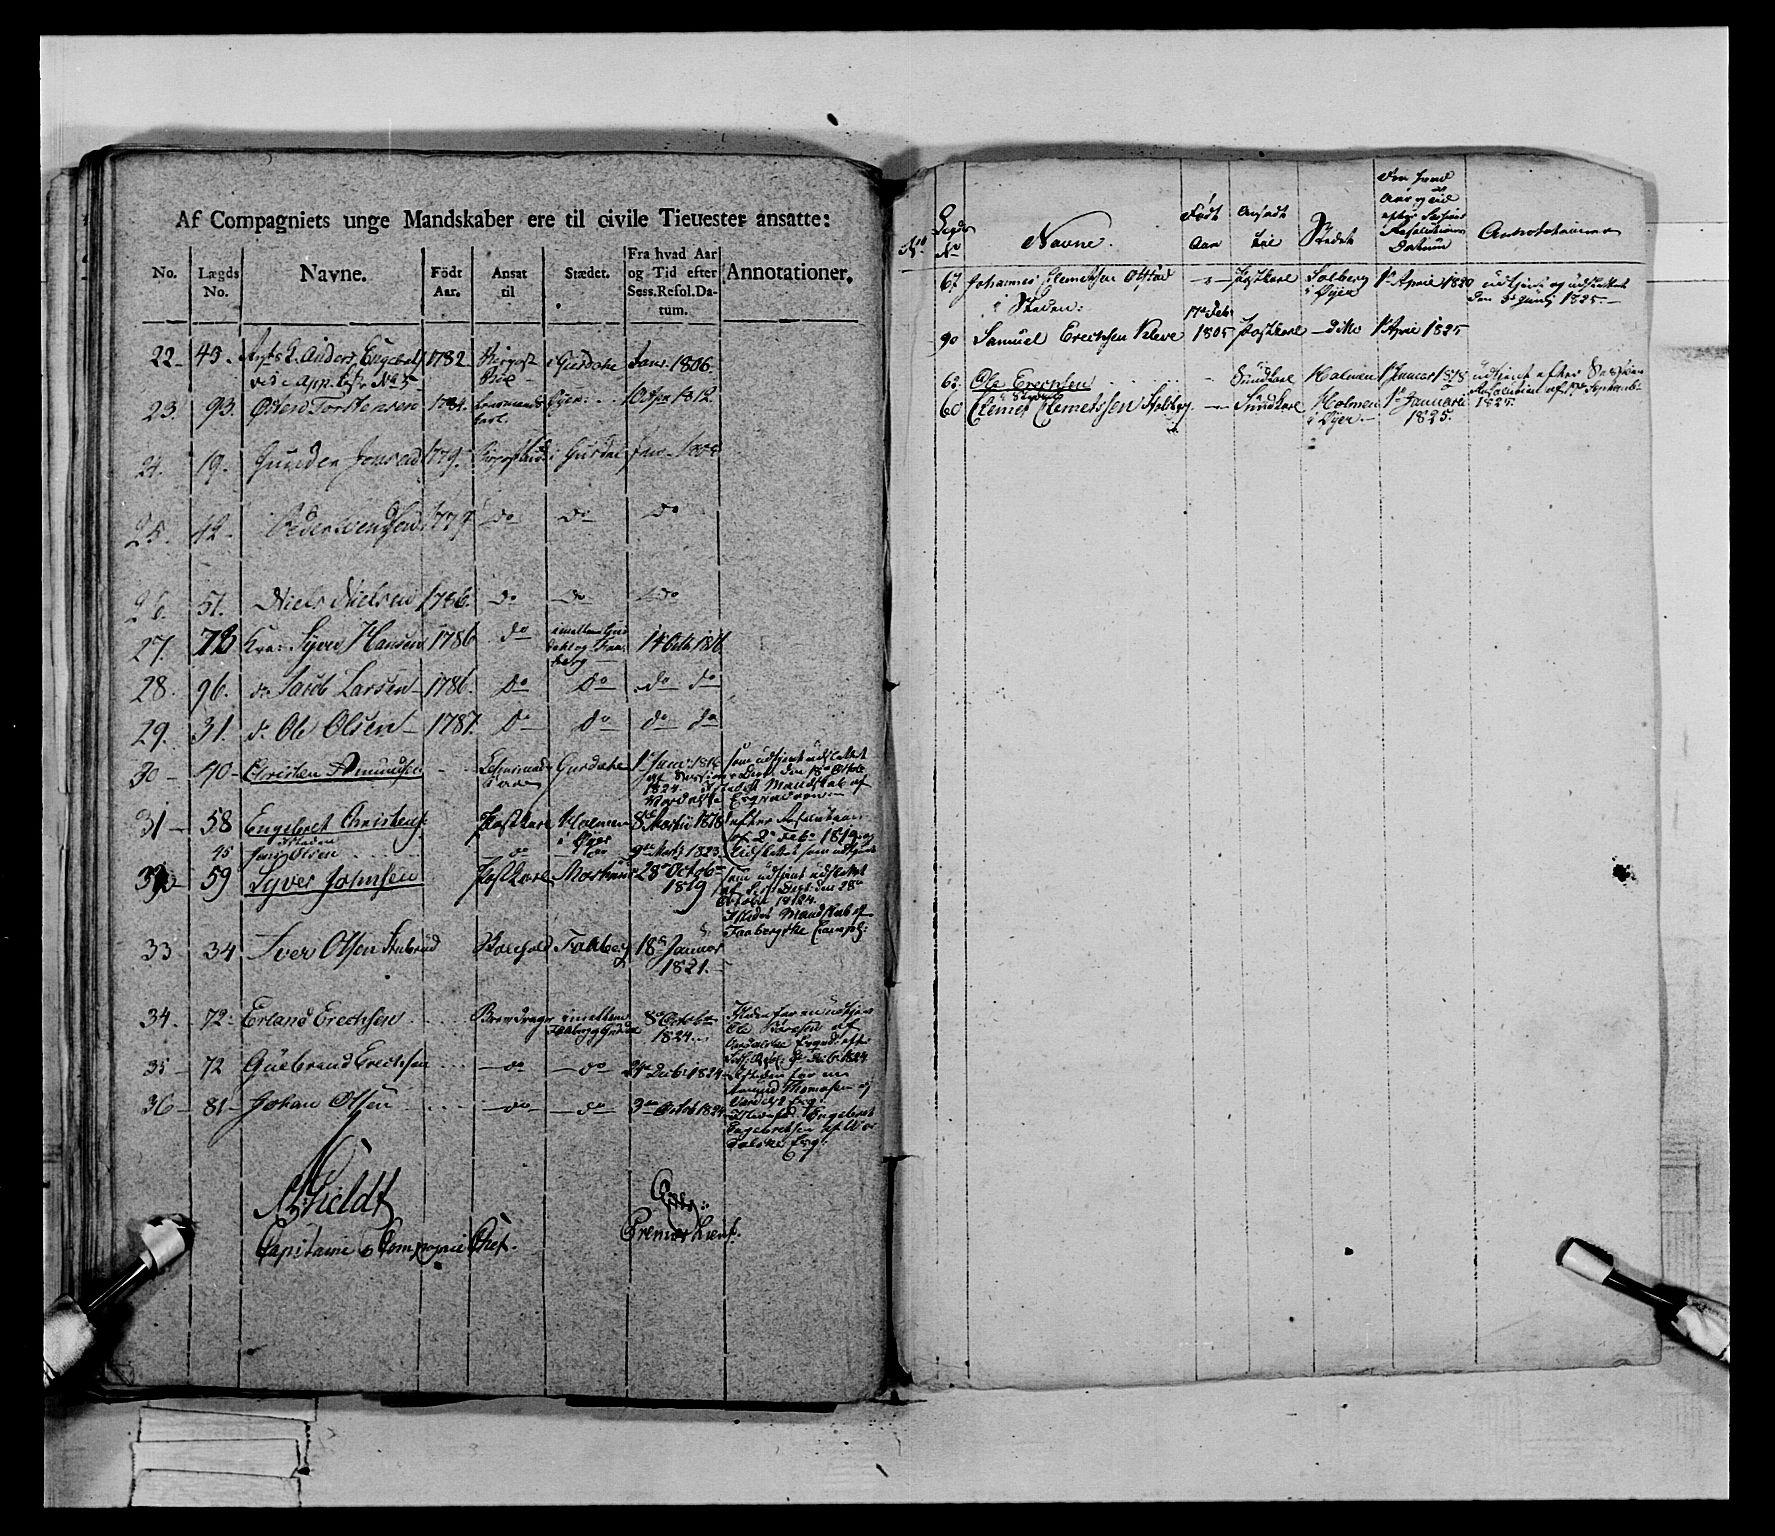 RA, Generalitets- og kommissariatskollegiet, Det kongelige norske kommissariatskollegium, E/Eh/L0069: Opplandske gevorbne infanteriregiment, 1810-1818, s. 418